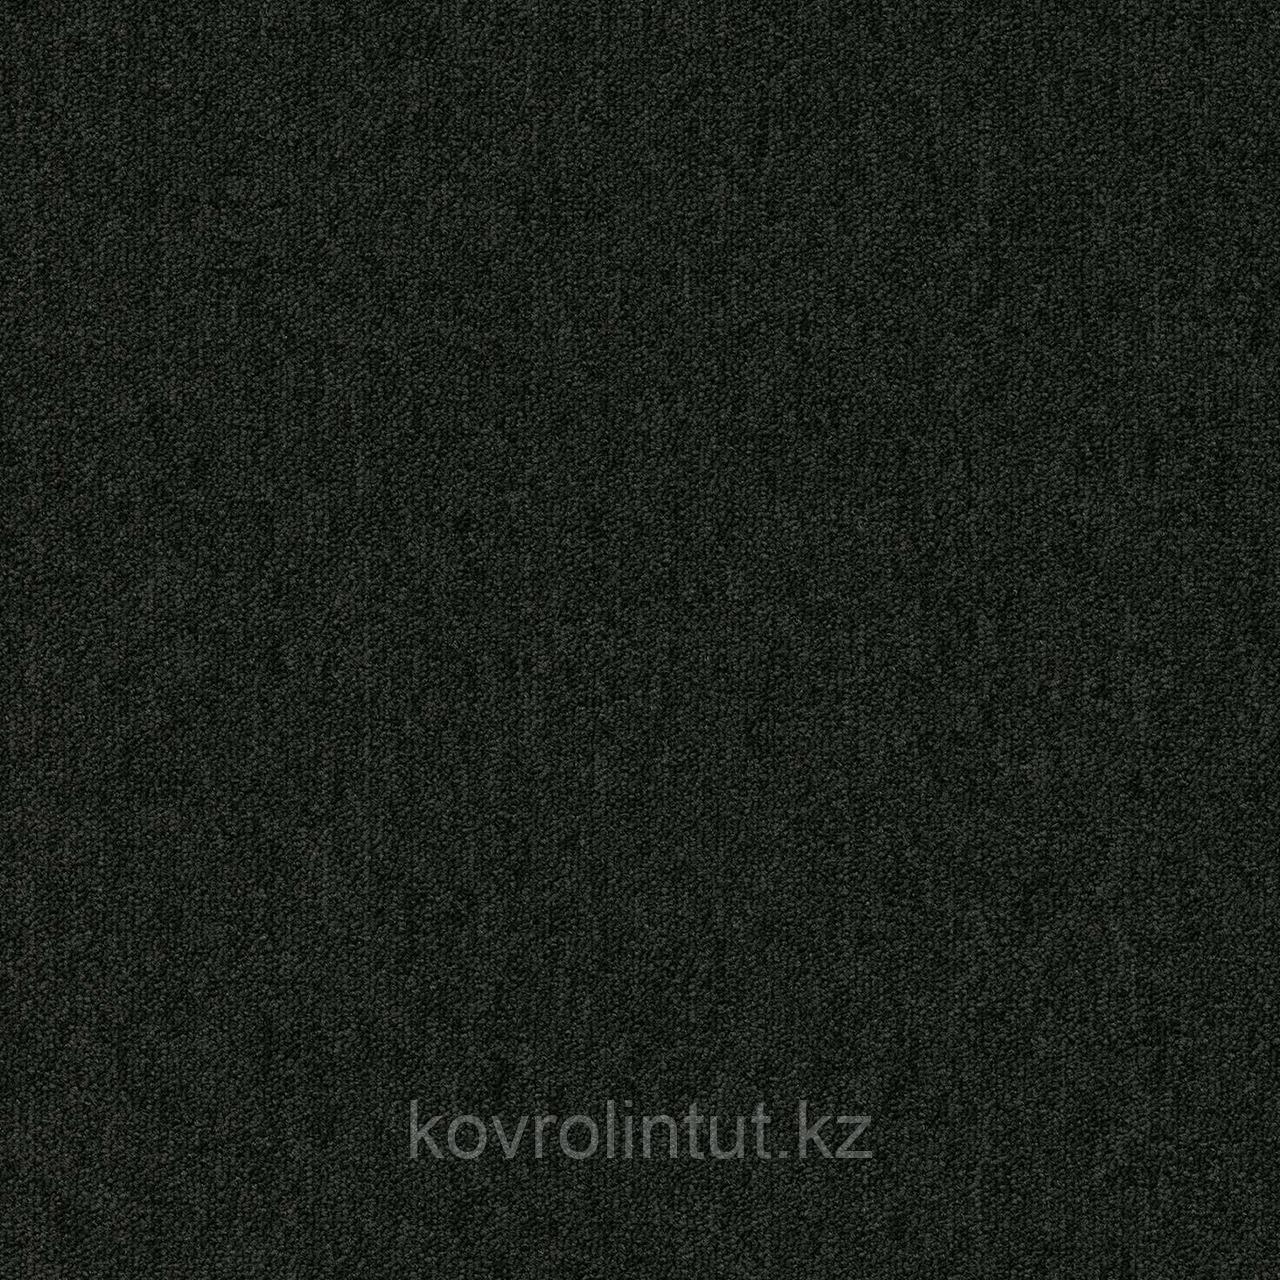 Плитка ковровая Modulyss First 990, 100% PA